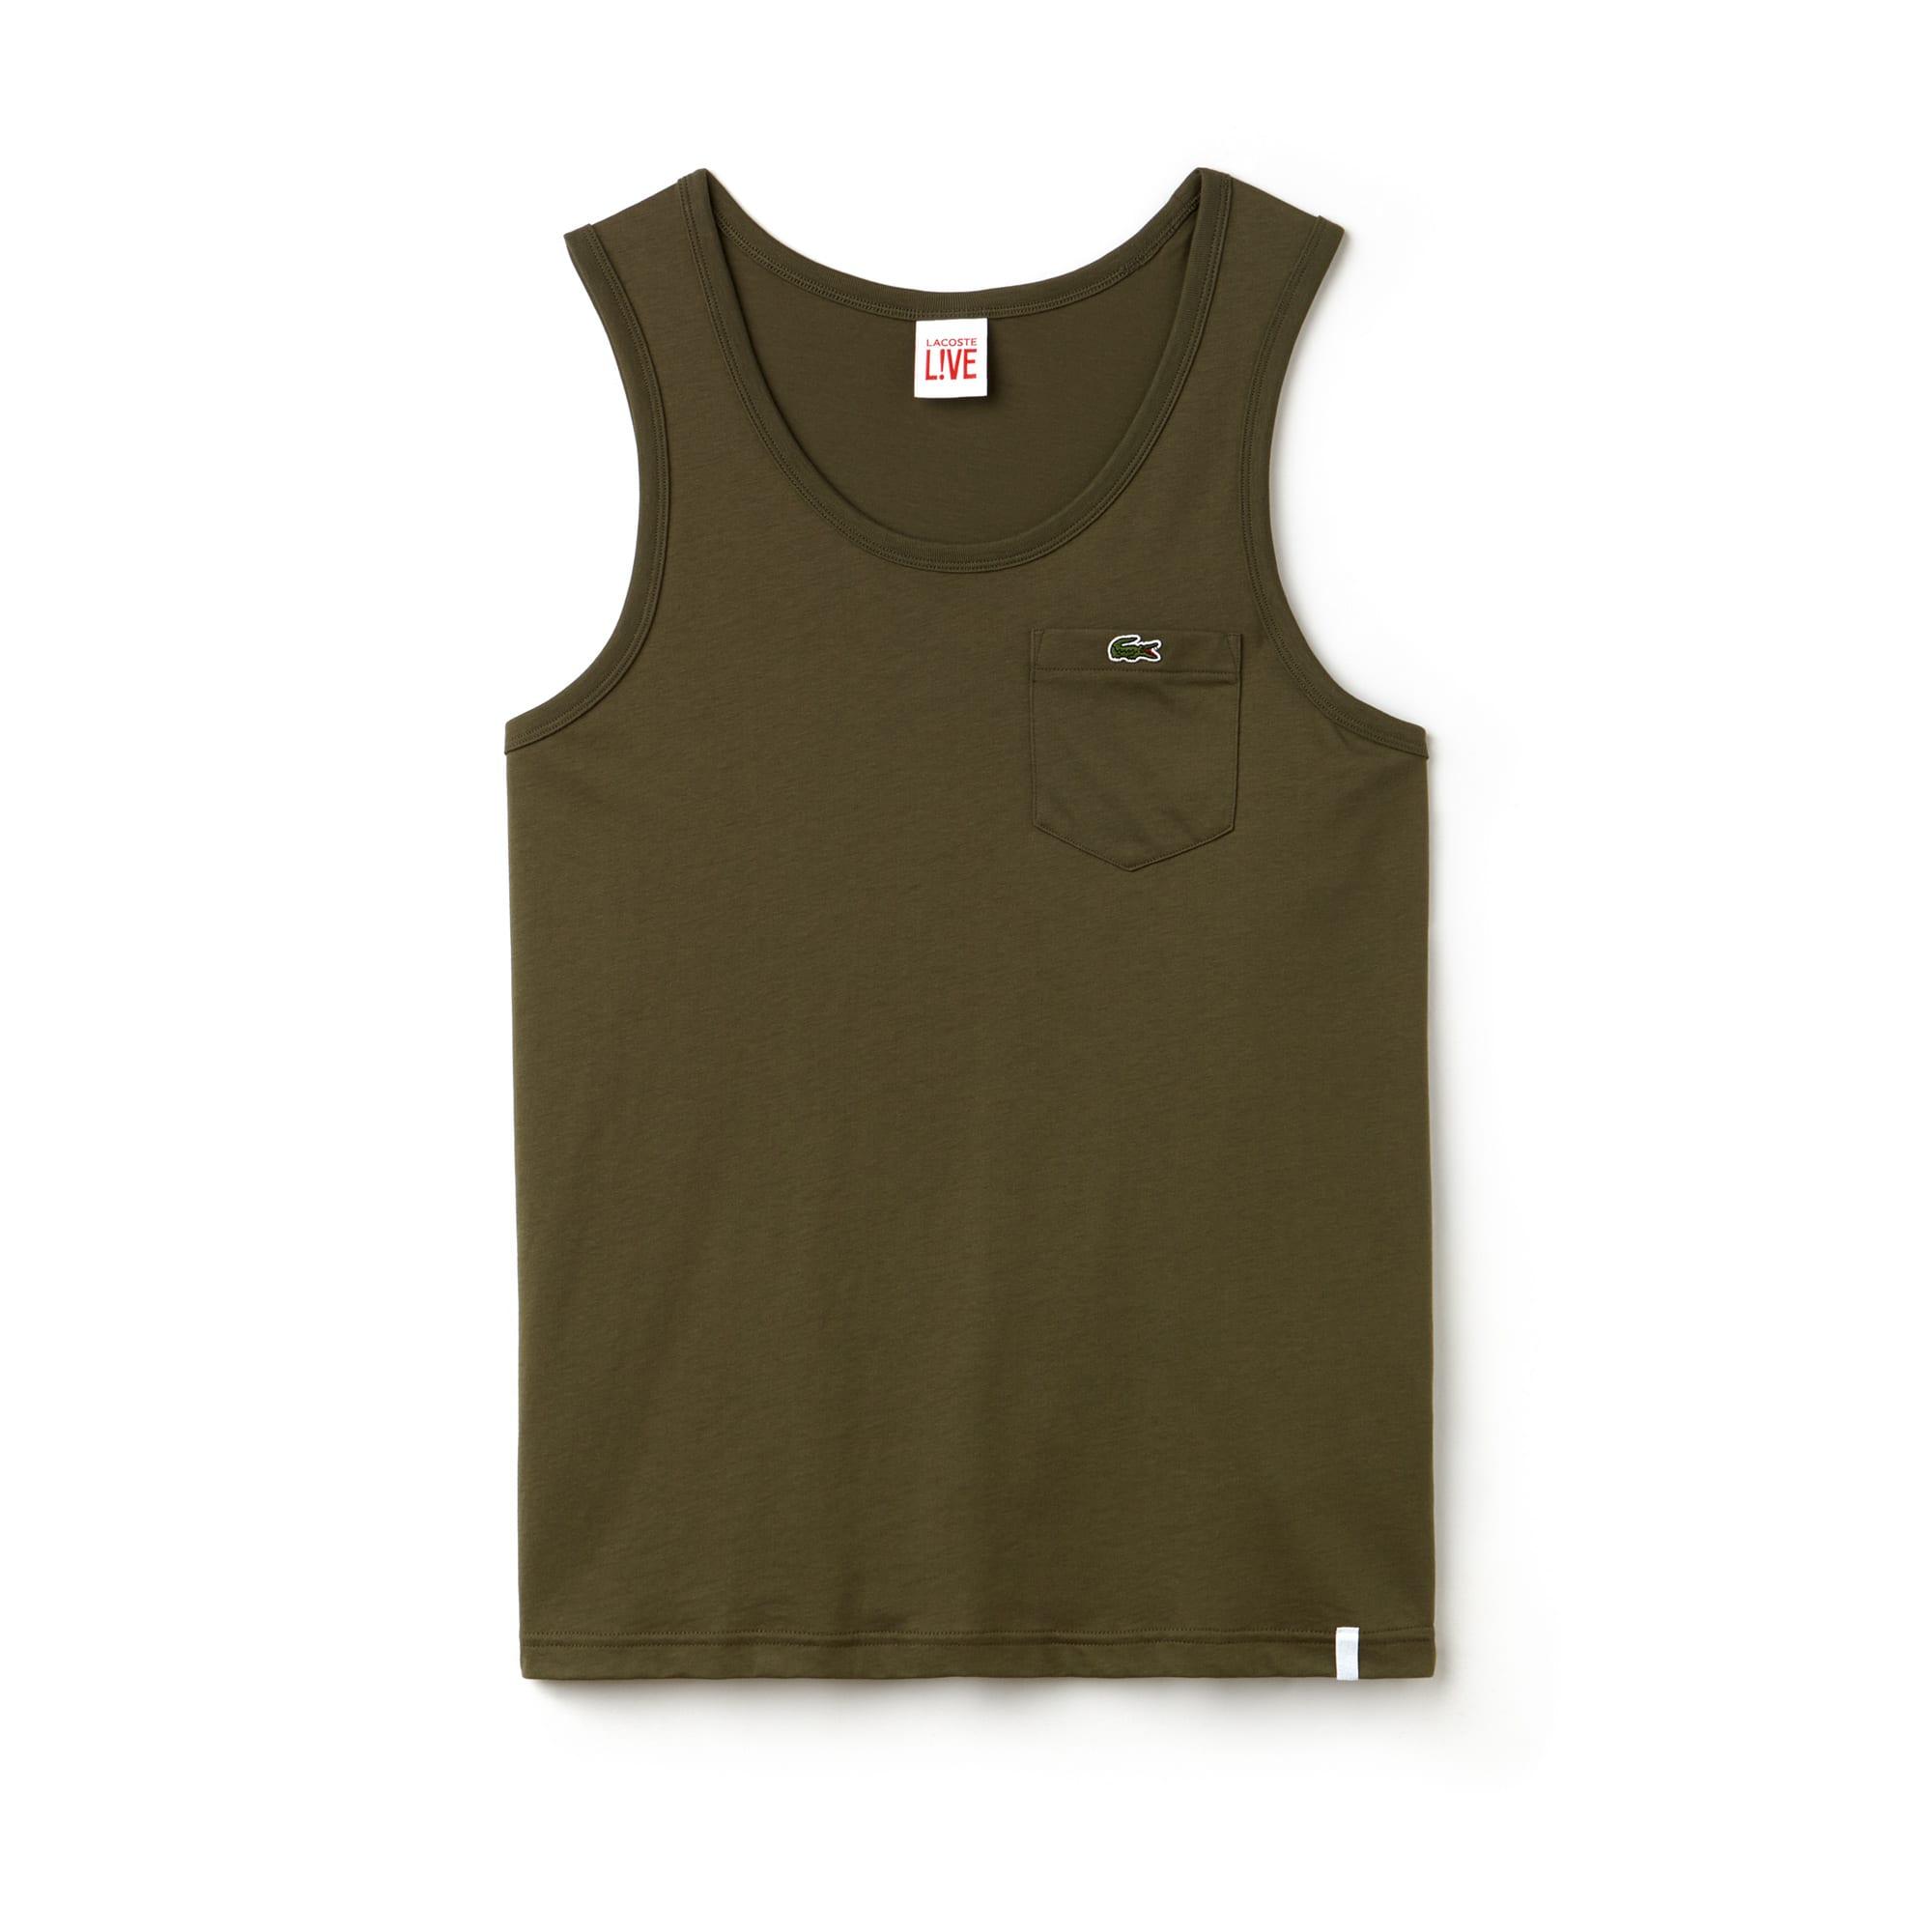 Top Lacoste LIVE de punto jersey de algodón liso con bolsillo